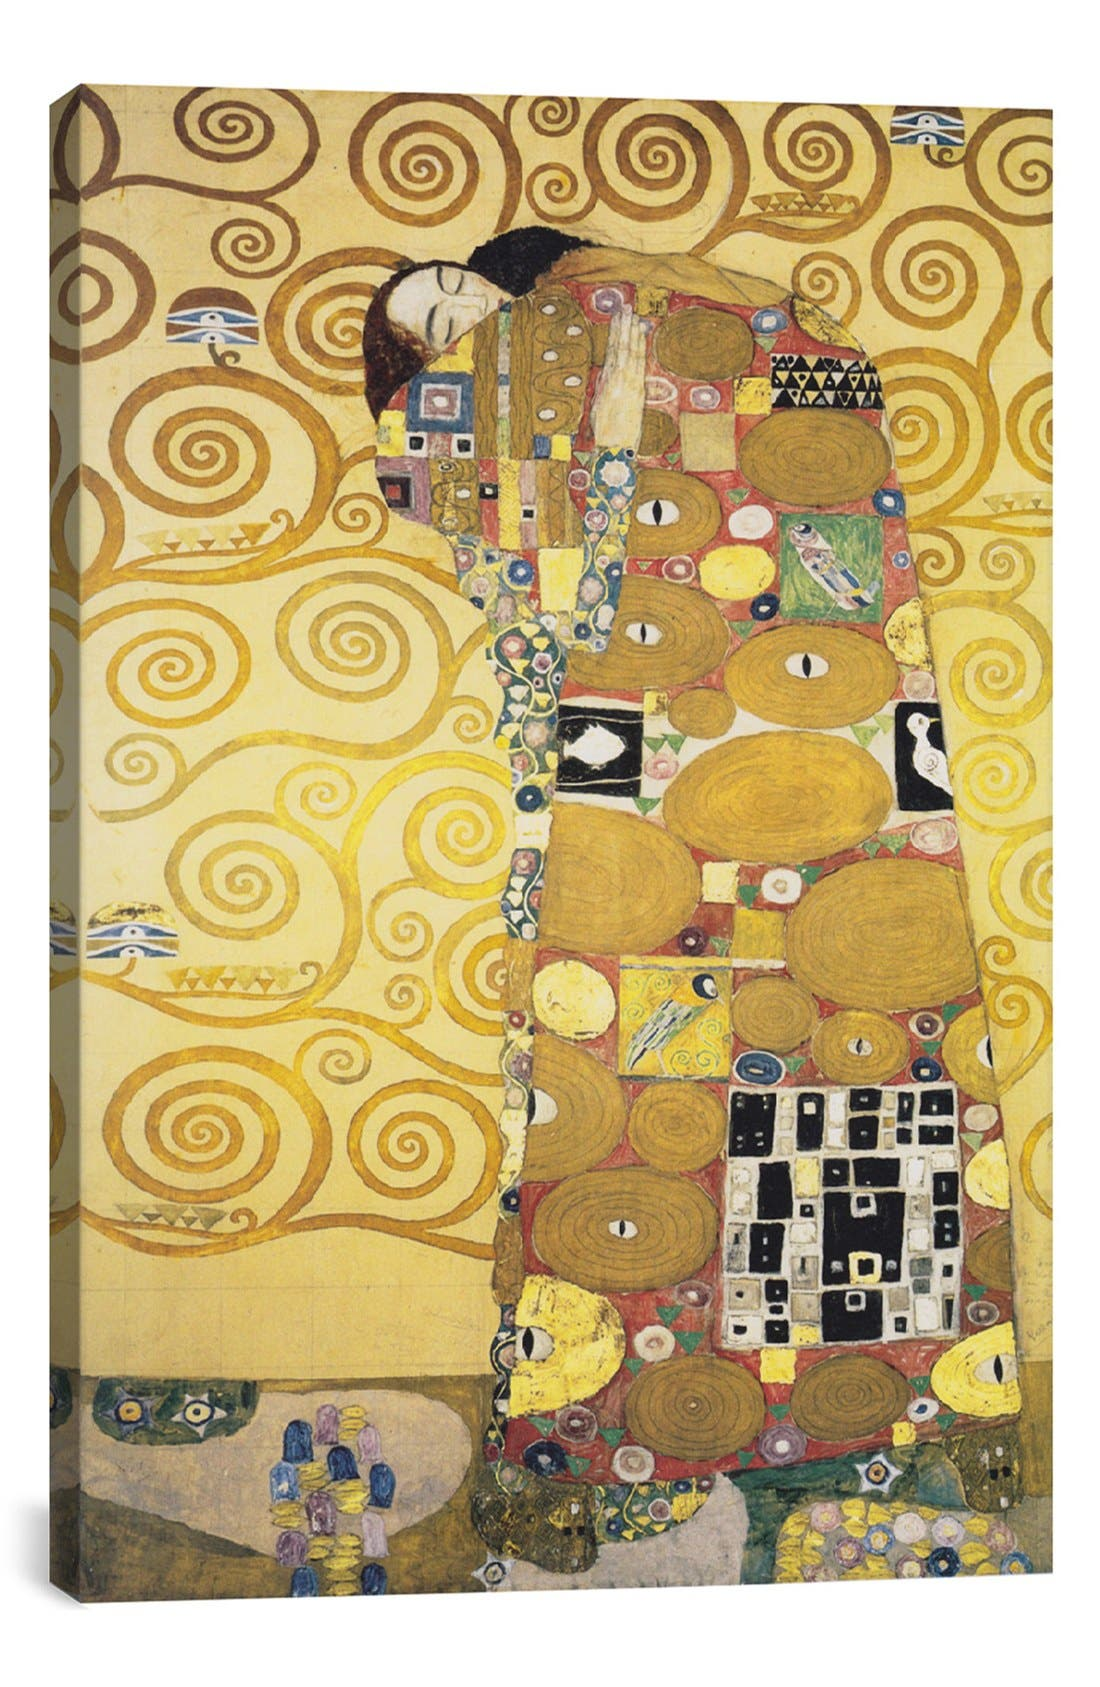 'Erfullung 1905 - Gustav Klimt' Giclée Print Canvas Art,                             Main thumbnail 1, color,                             Yellow